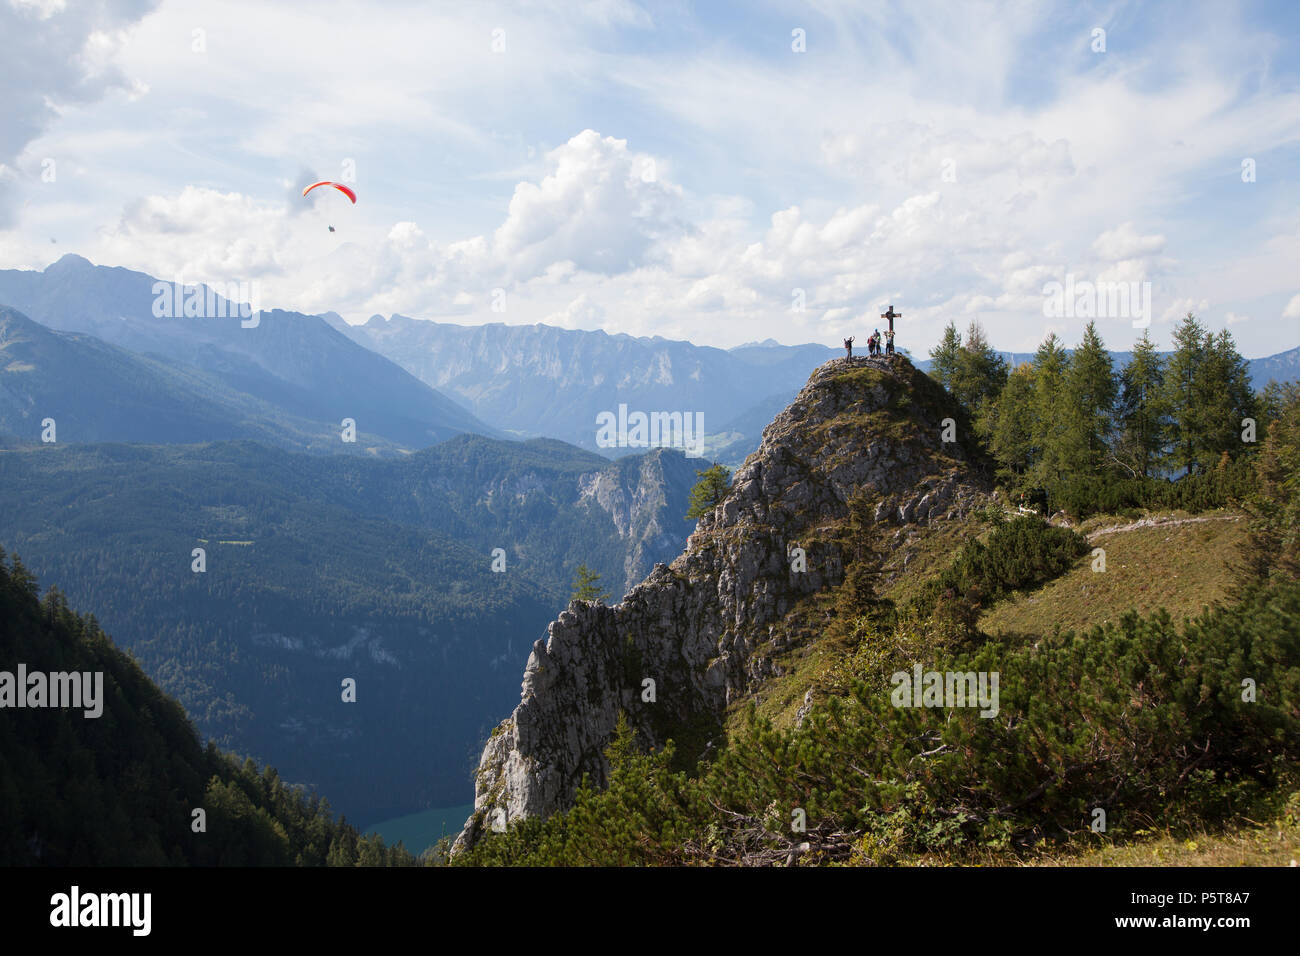 Klettersteig Jenner : Klettersteig am jenner im berchtesgadener land mit gipfelkreuz